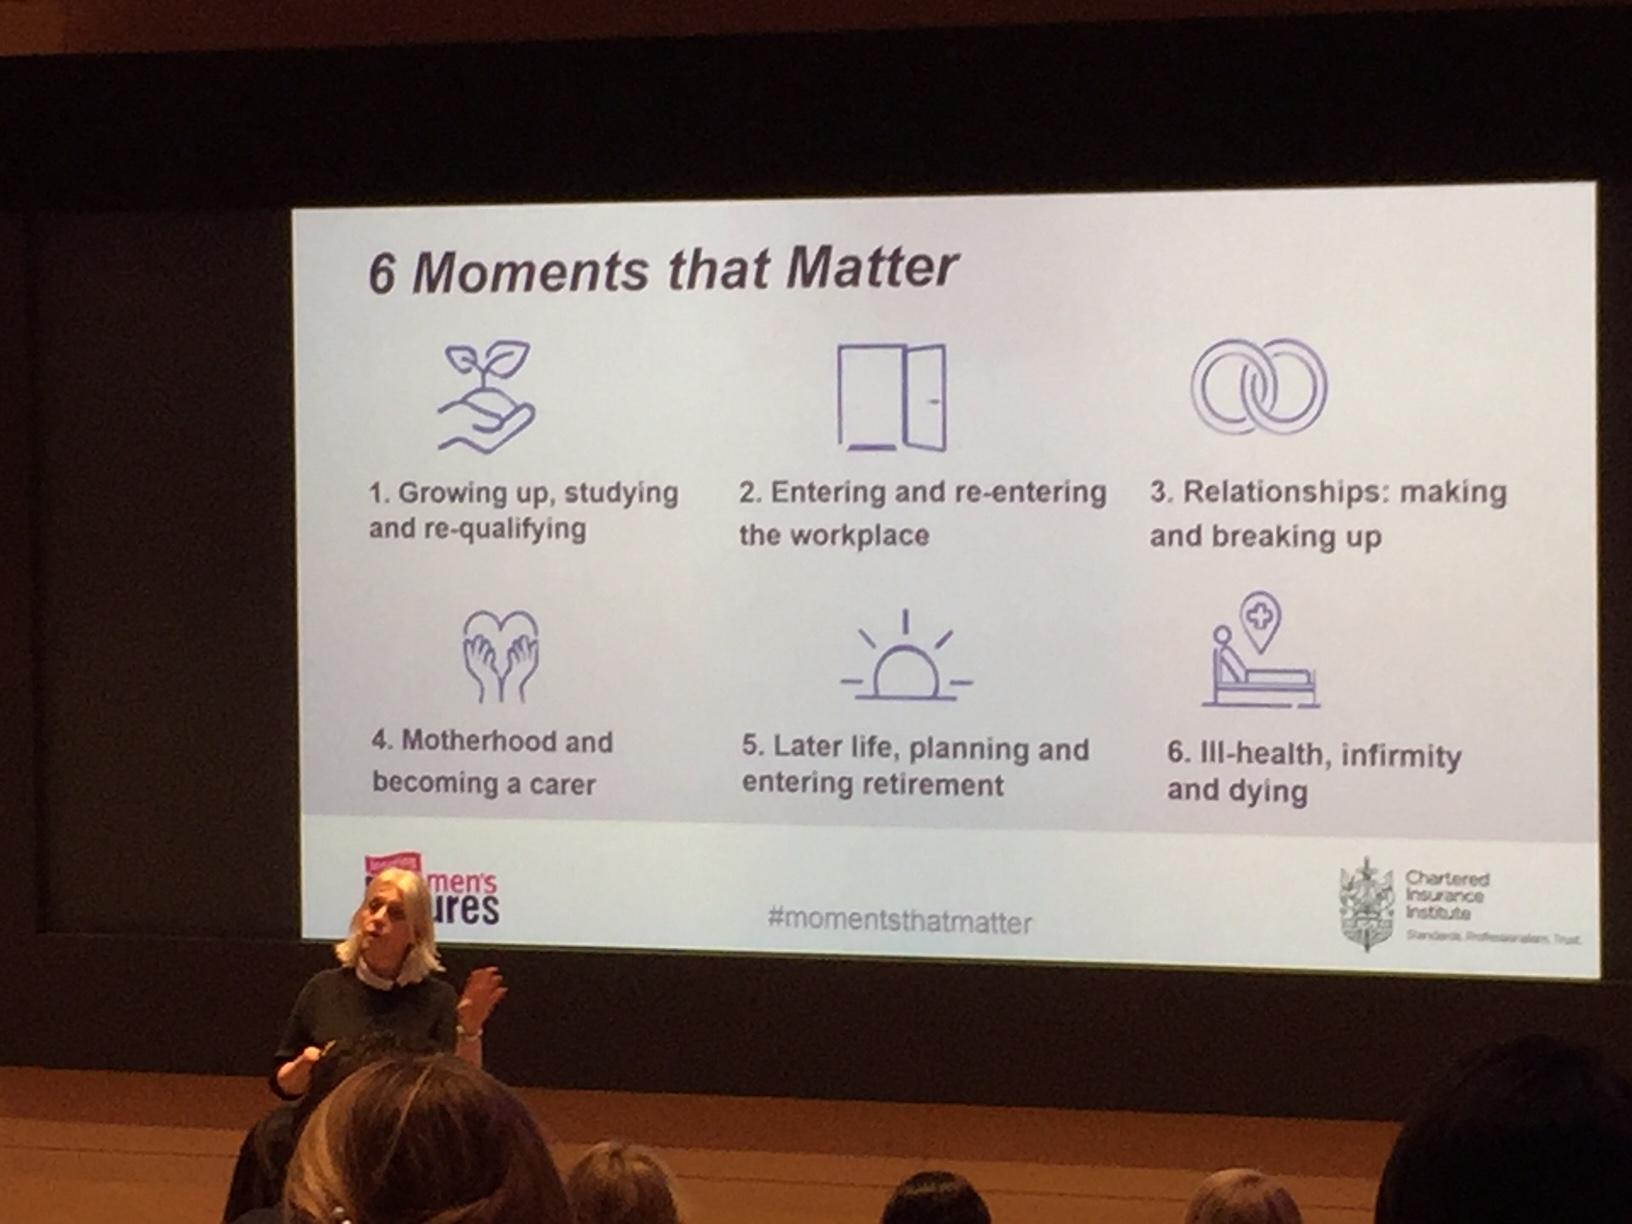 Jane Portas presenting the IWF findings.